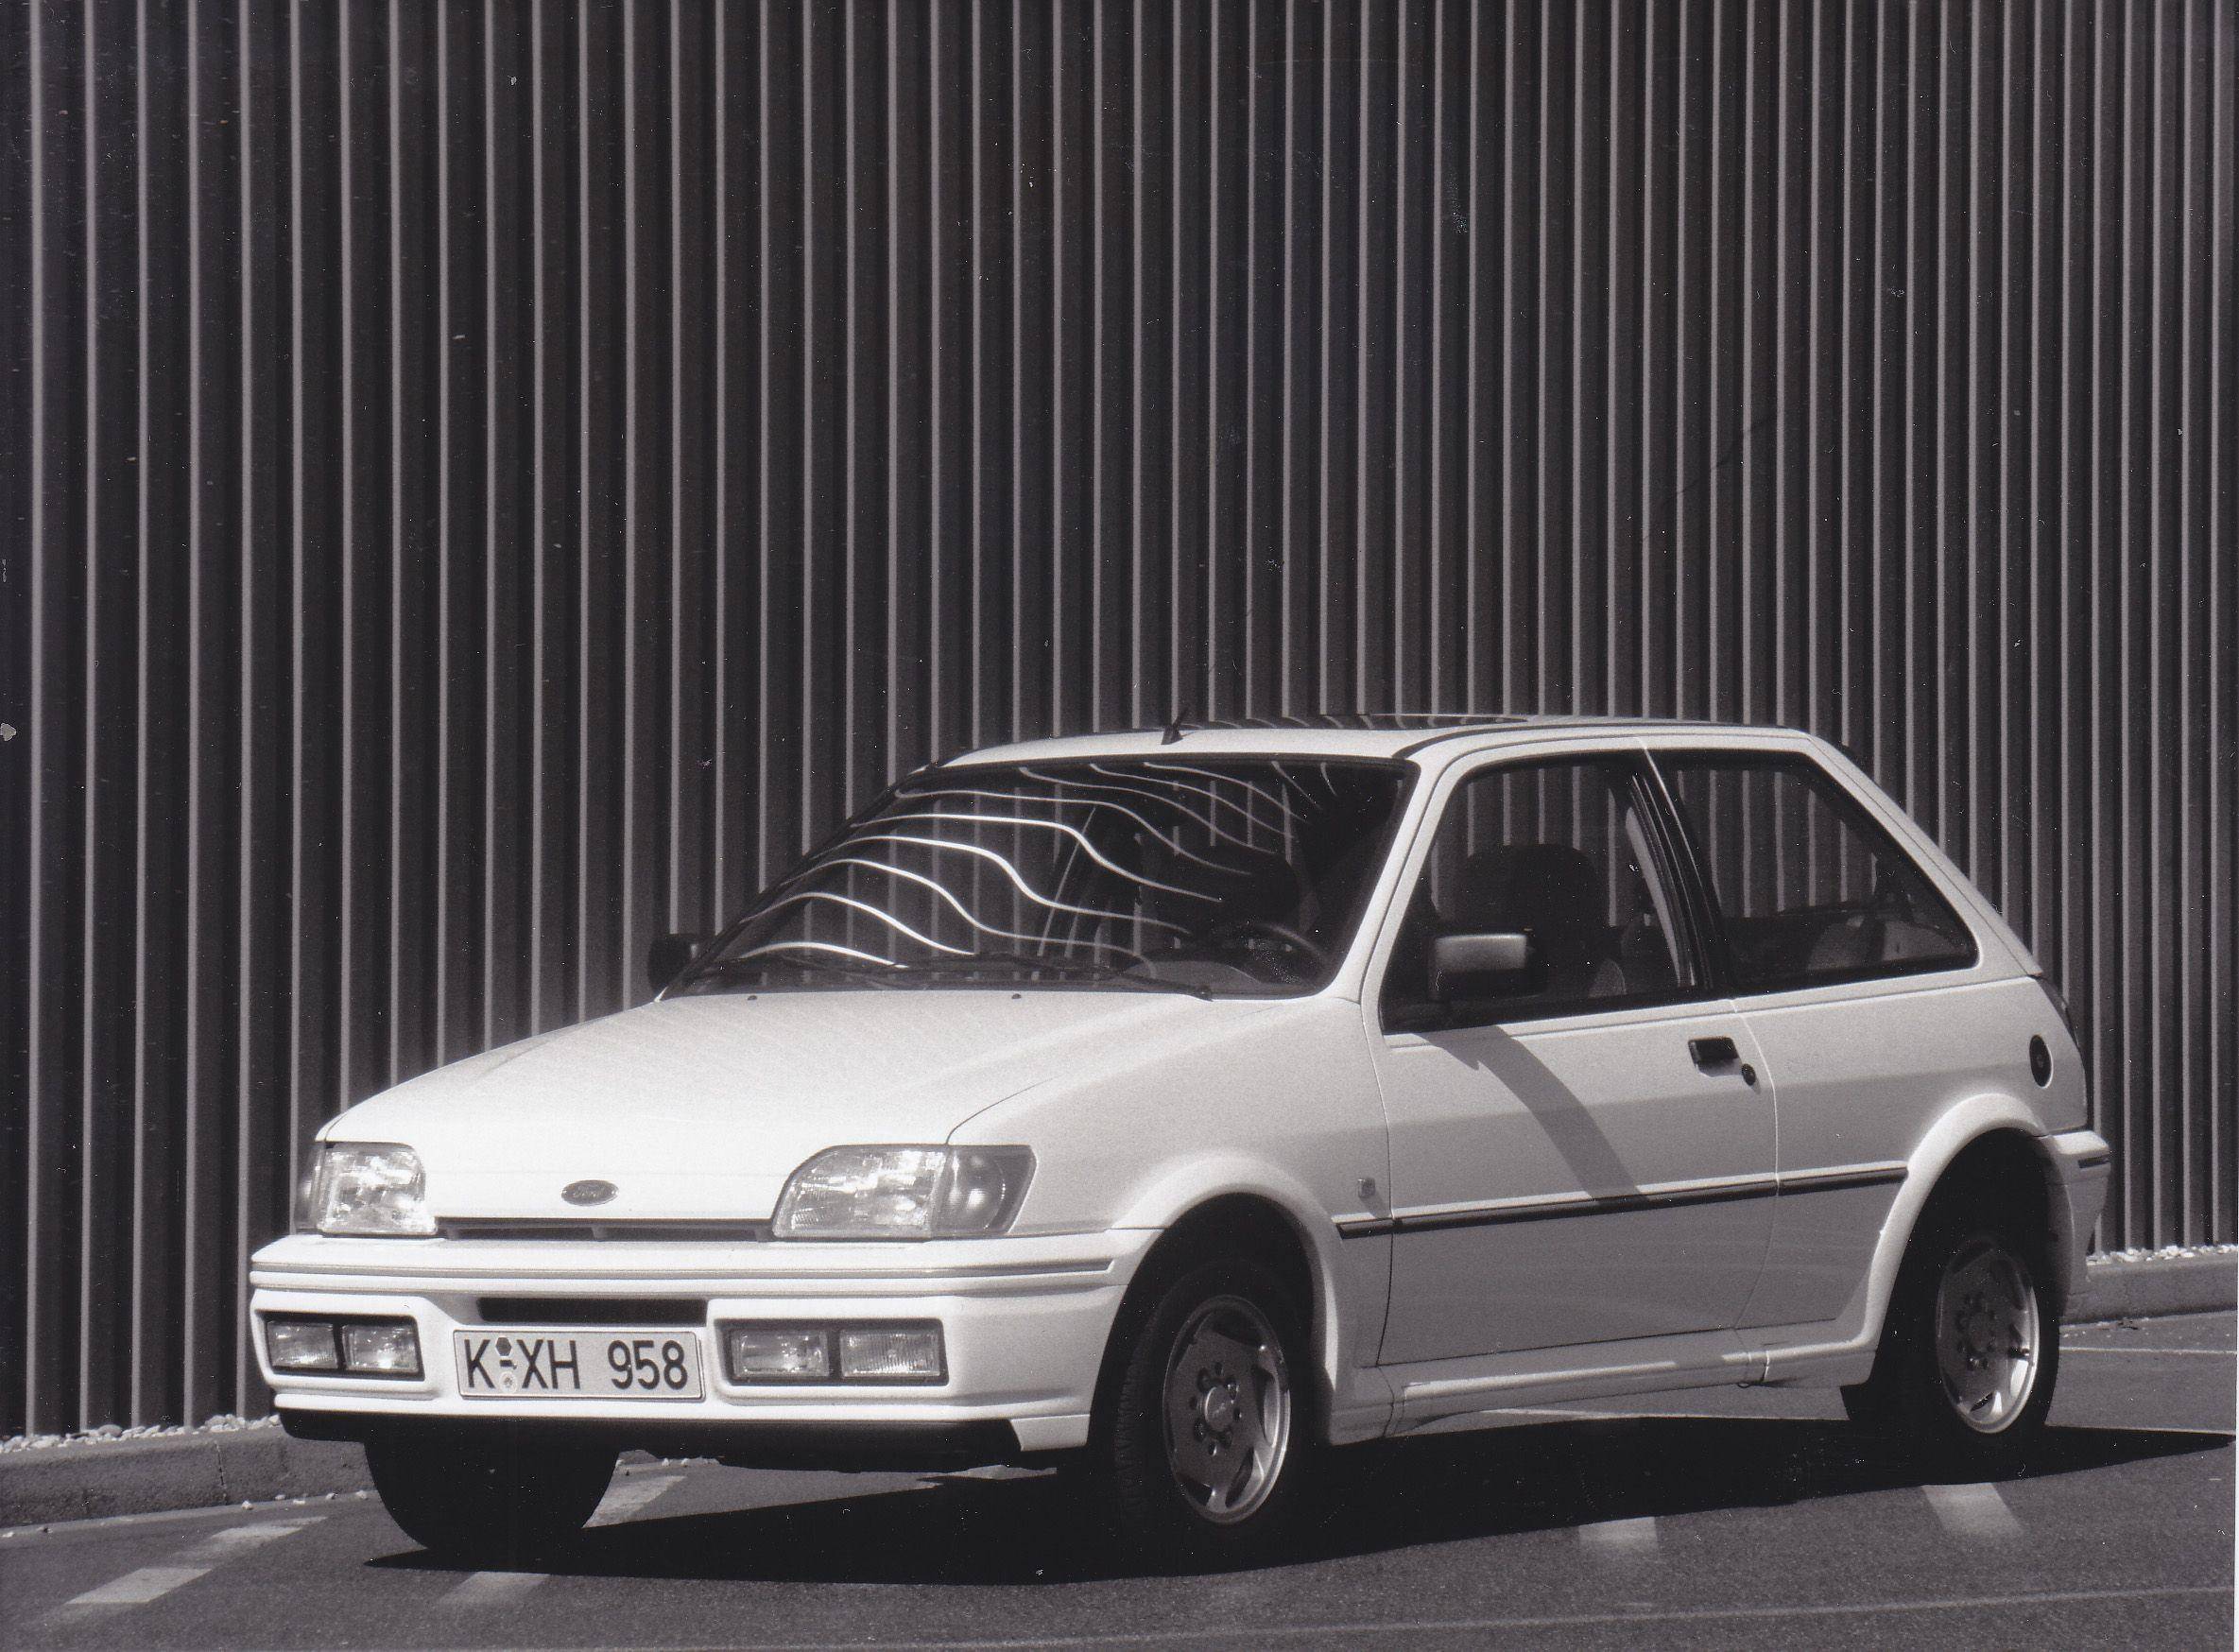 Ford Fiesta Xr2i Iaa 1989 Euro Cars Luxury Cars Photo